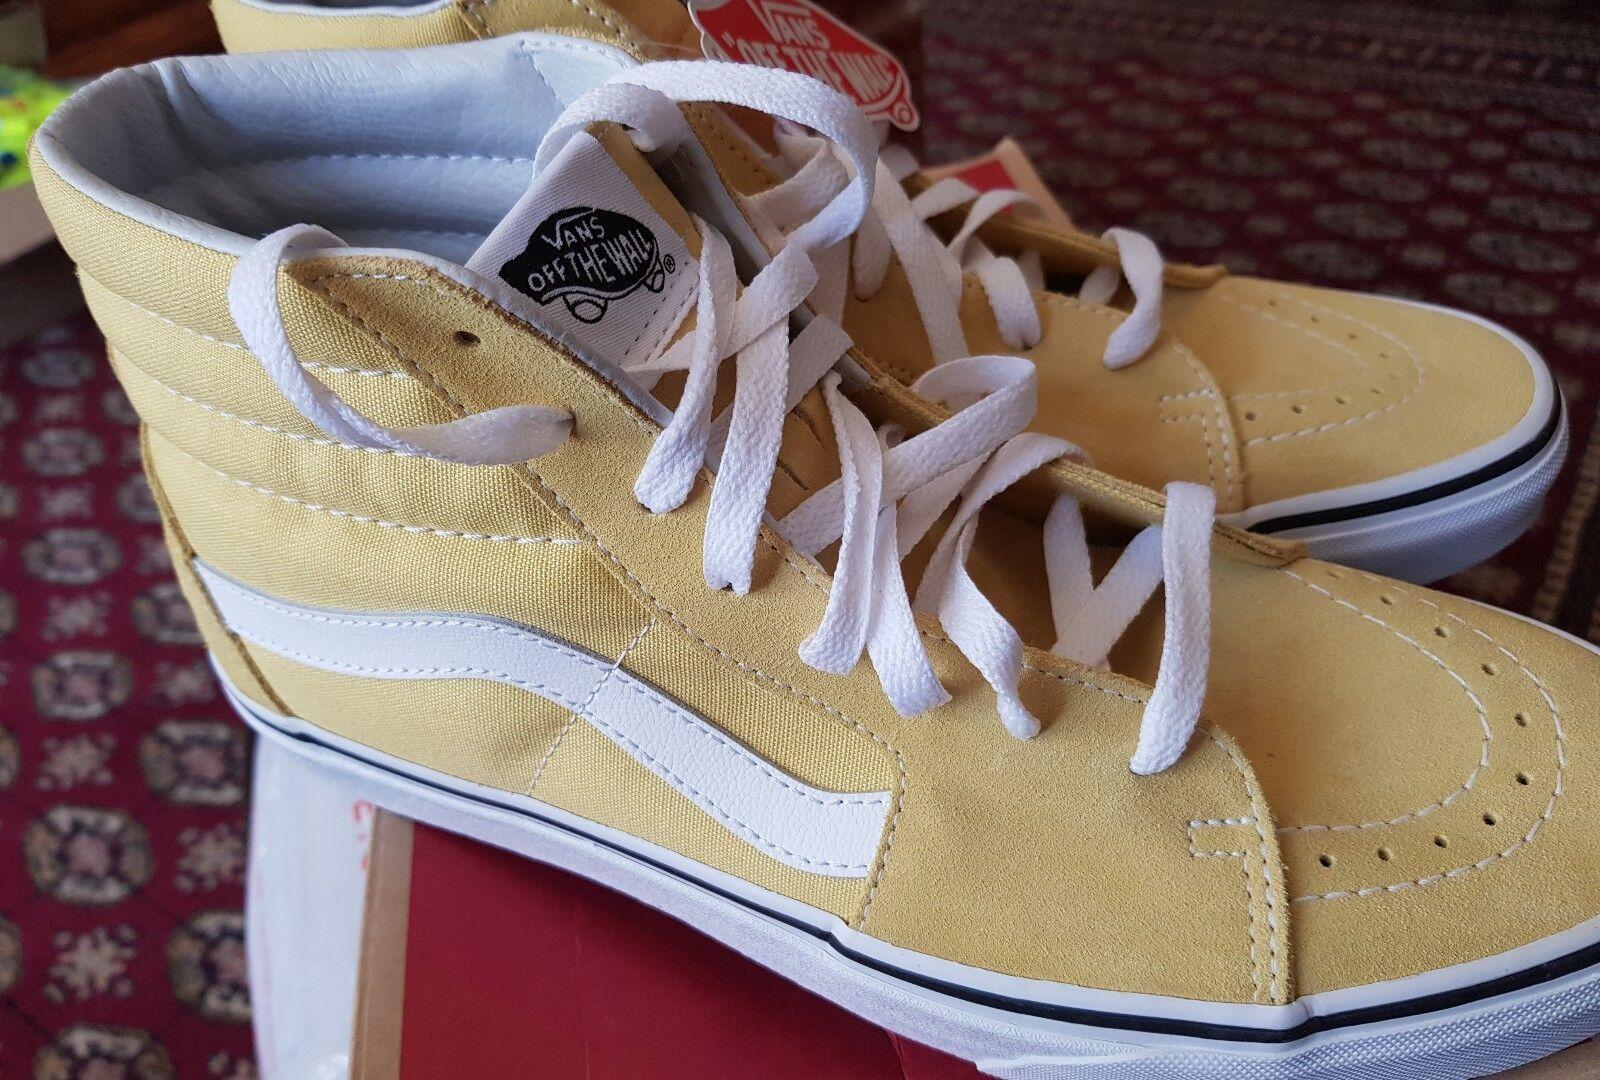 Vans Unisex Adulti'S Sk8-Hi Scarpe Da Ginnastica Giallo (Dusky Citron/True White) 9 UK